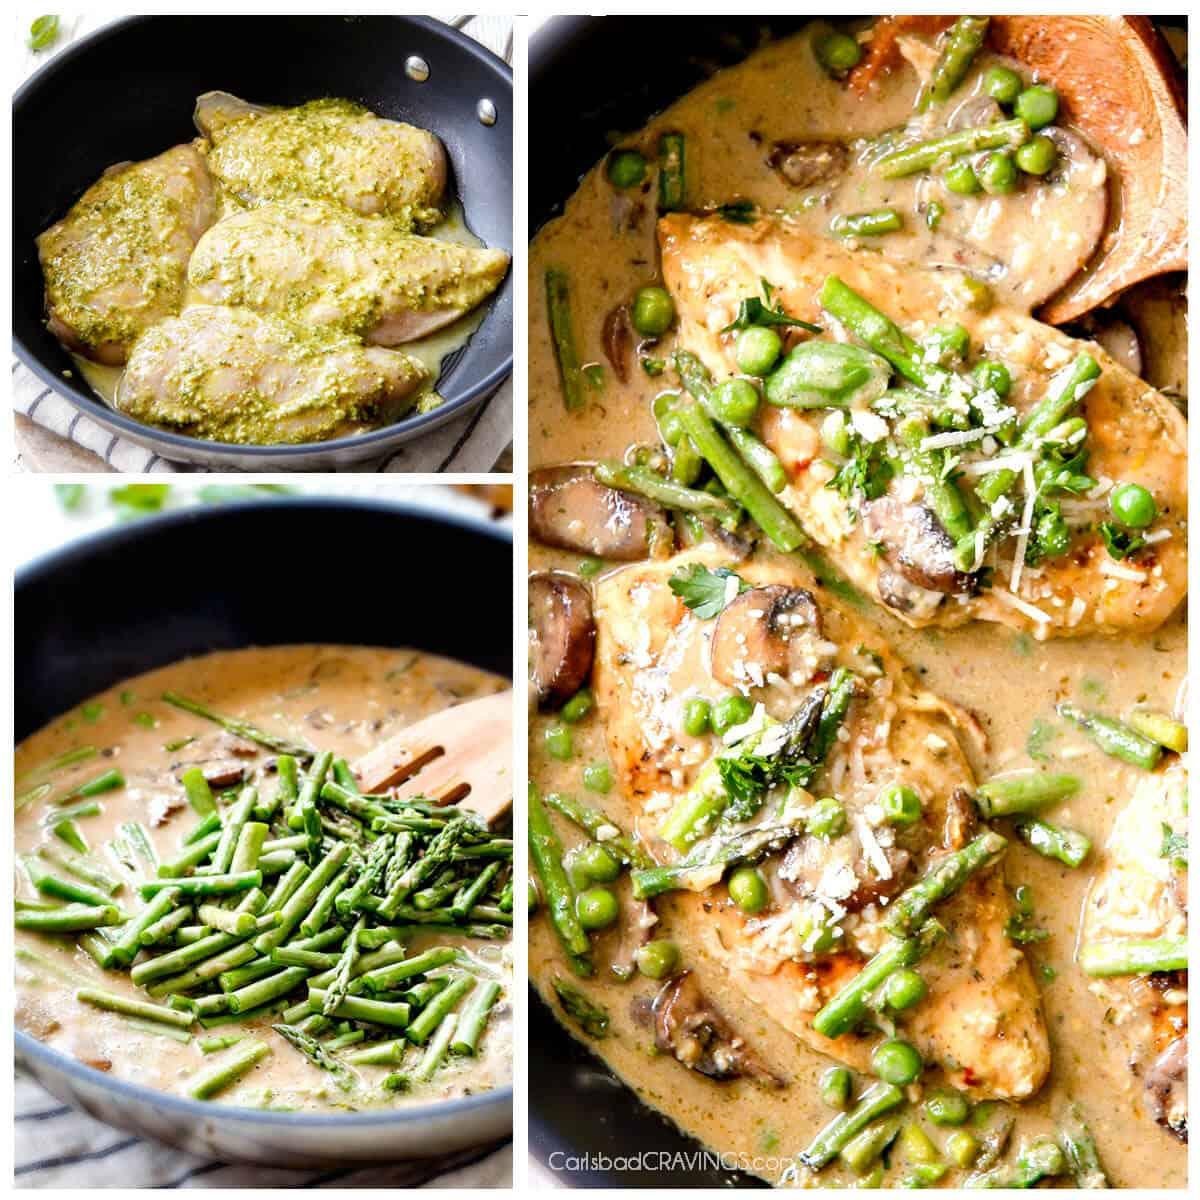 Creamy Parmesan Pesto Chicken Skillet - Carlsbad Cravings